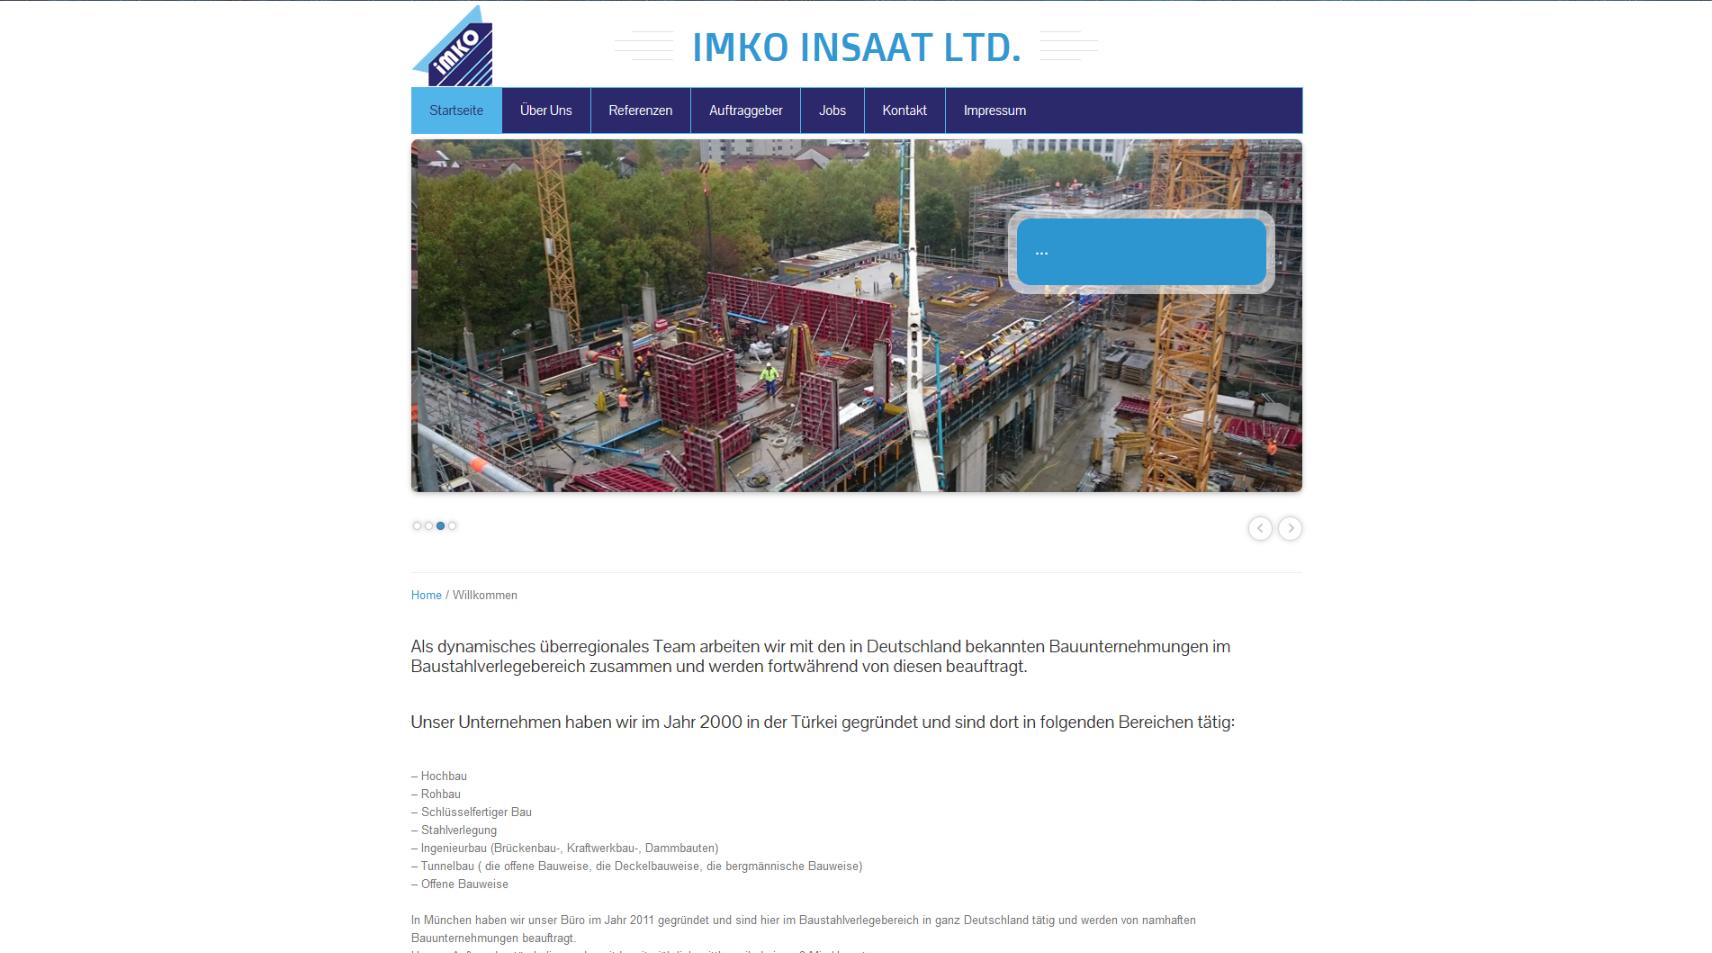 Imko Insaat - 81379 München